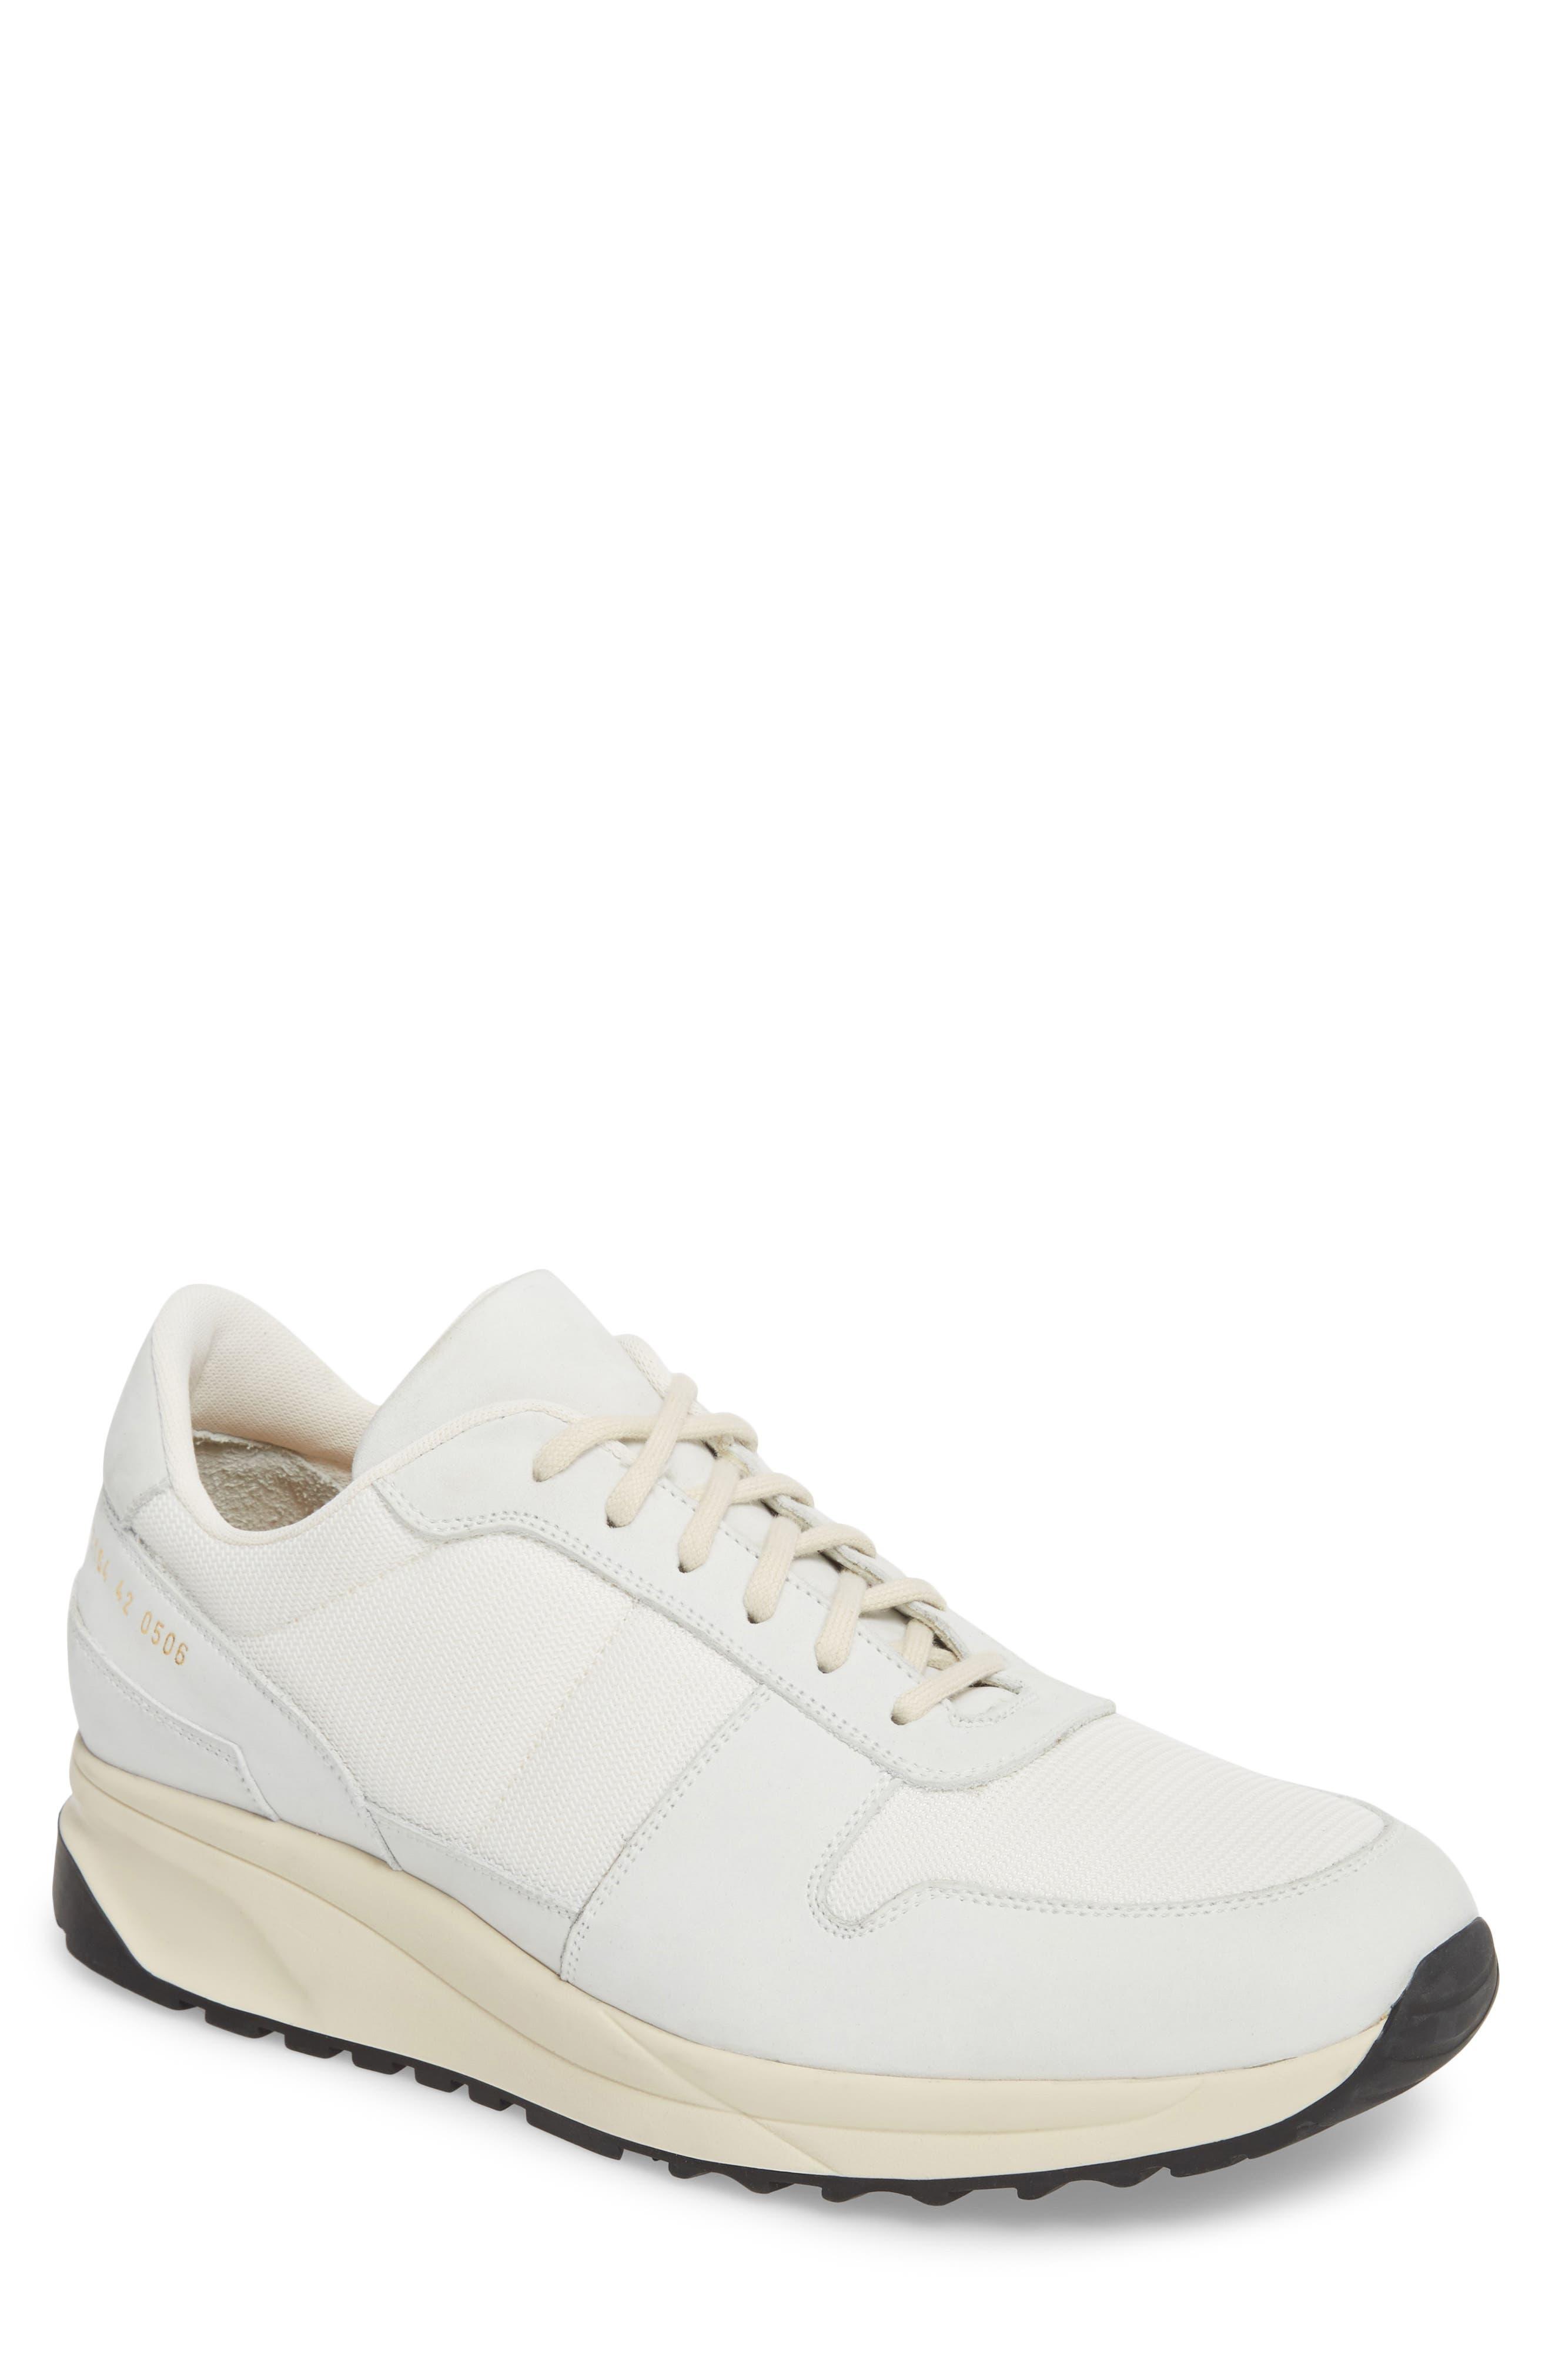 Track Vintage Sneaker,                         Main,                         color, WHITE